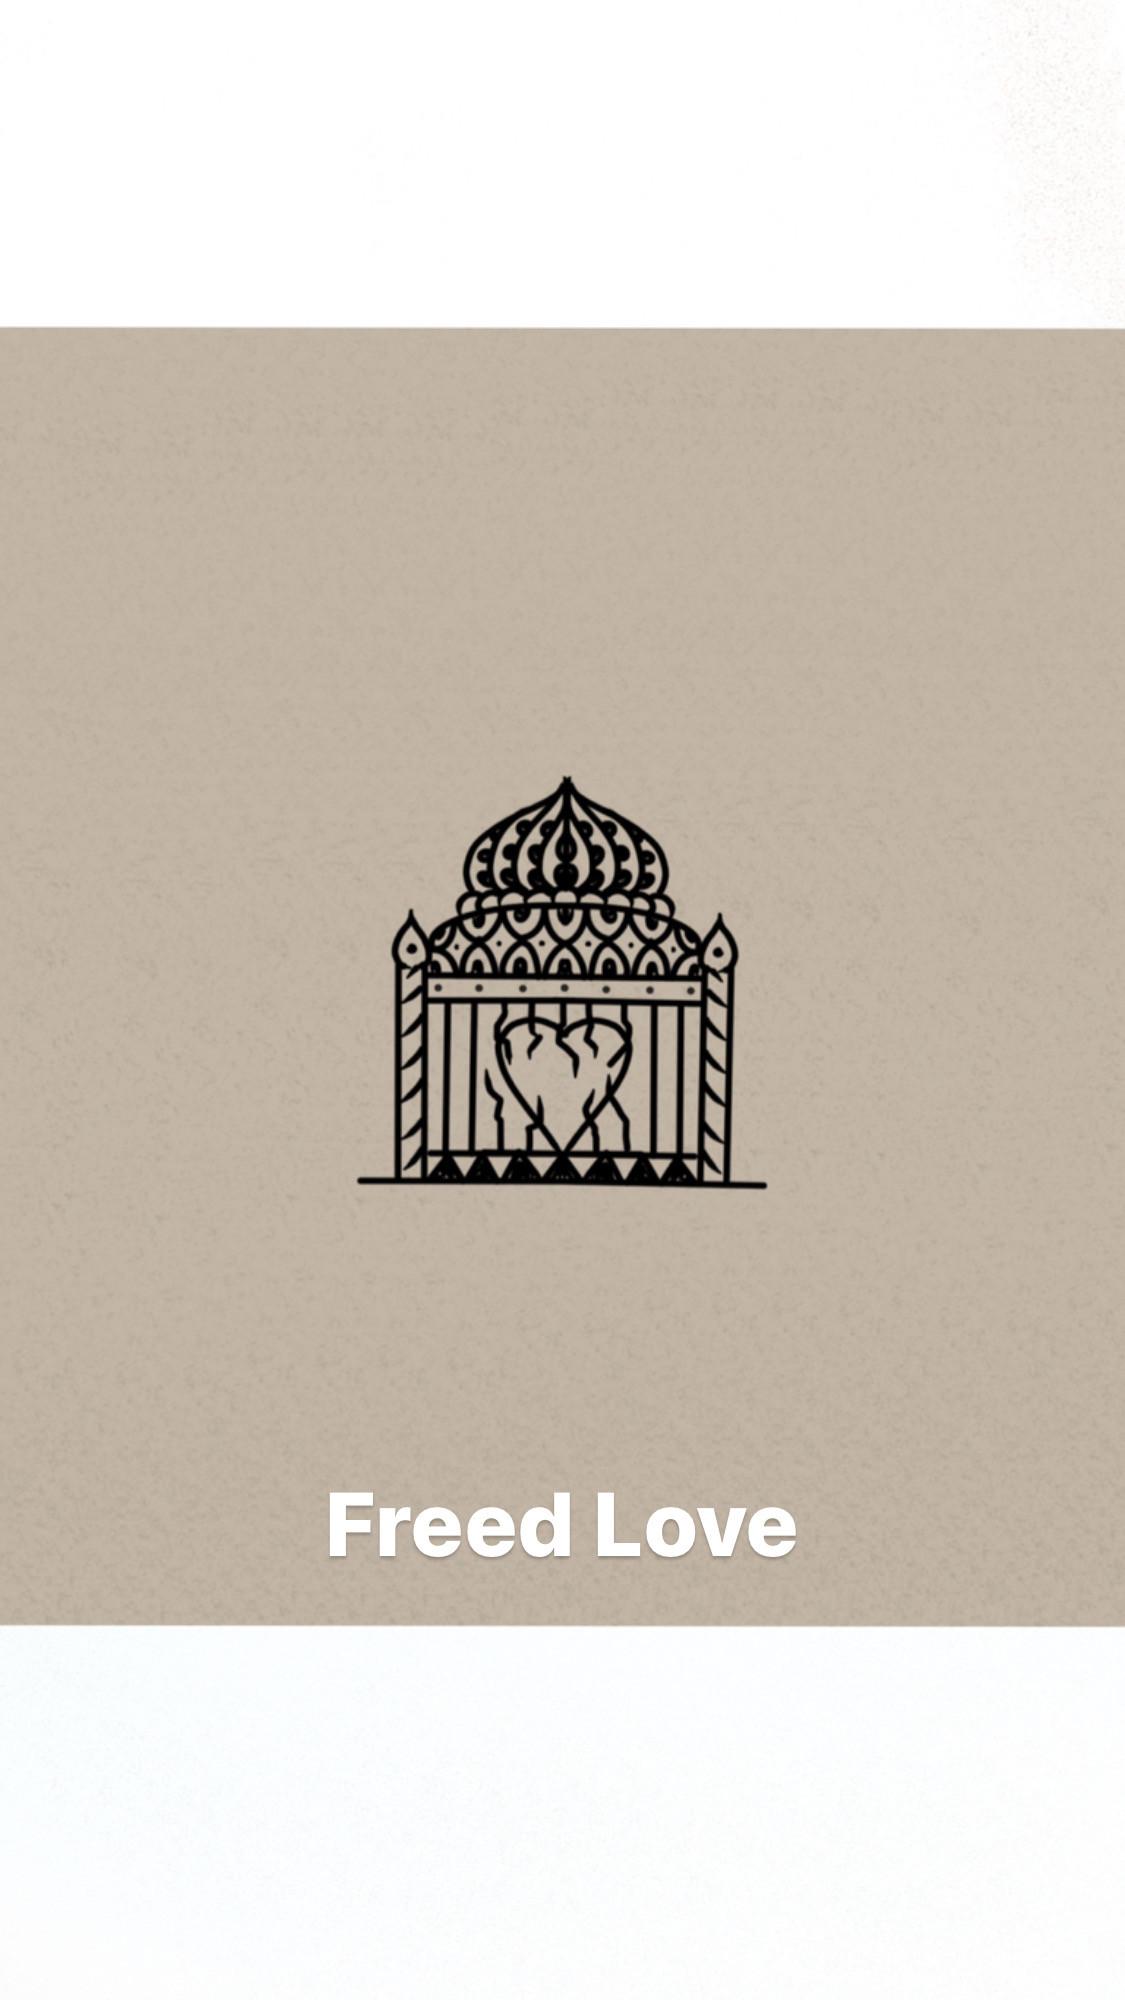 Freed Love